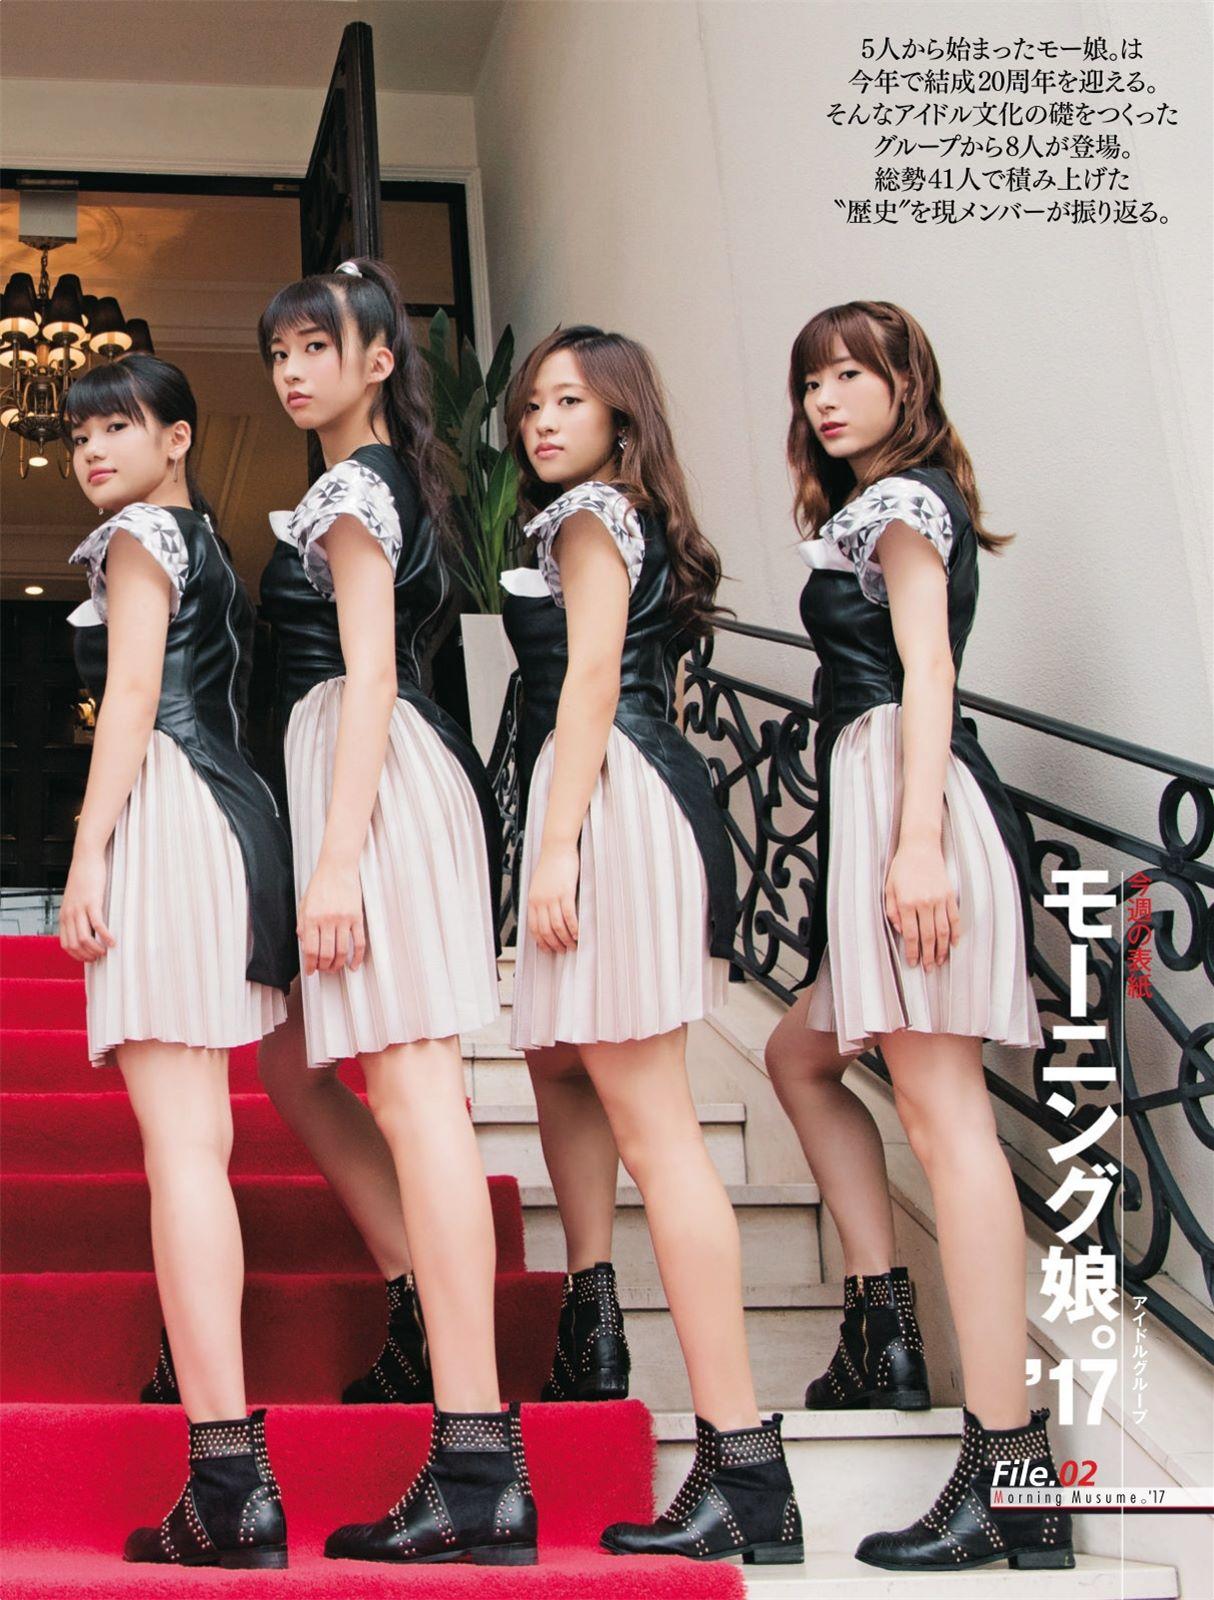 Morning Musume, Shukan SPA! 2017.09.12 (週刊スパ 2017年09月12日号)